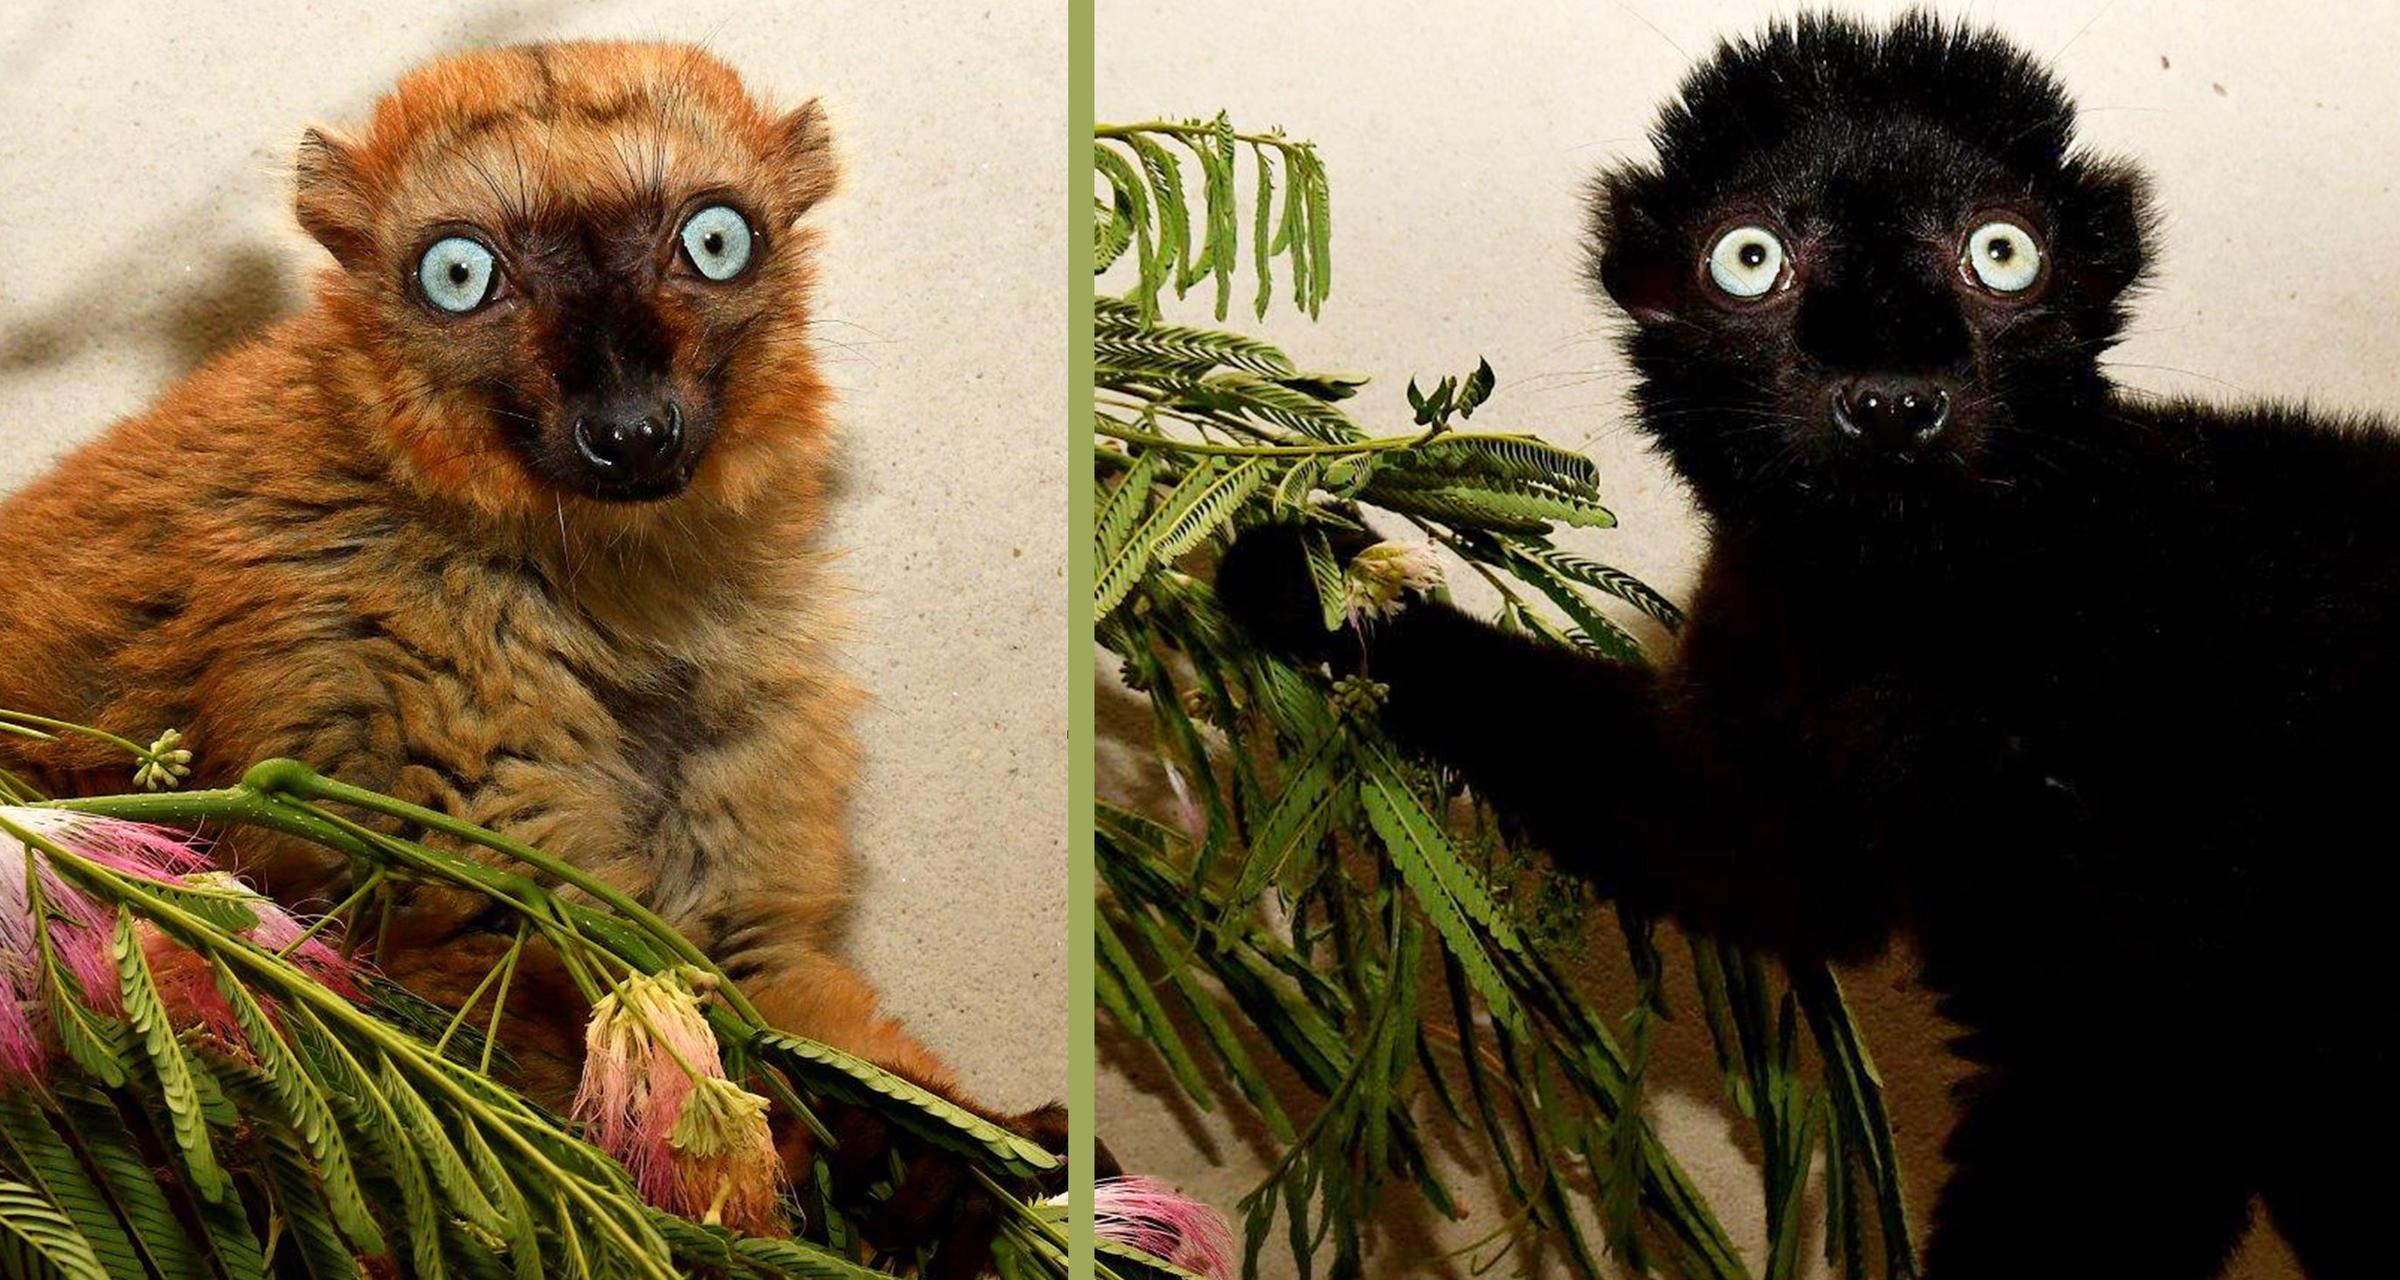 Duke University Receives 2 Endangered Lemurs From Madagascar | WUNC